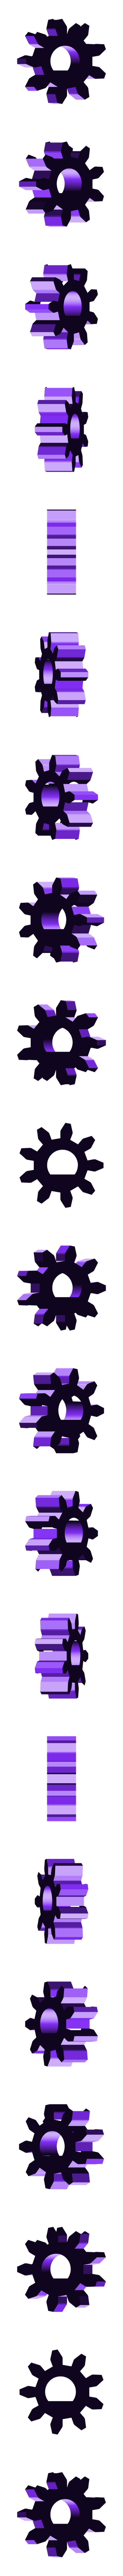 pot_gear.stl Download free STL file Throttle / Pedal • 3D printer template, Job